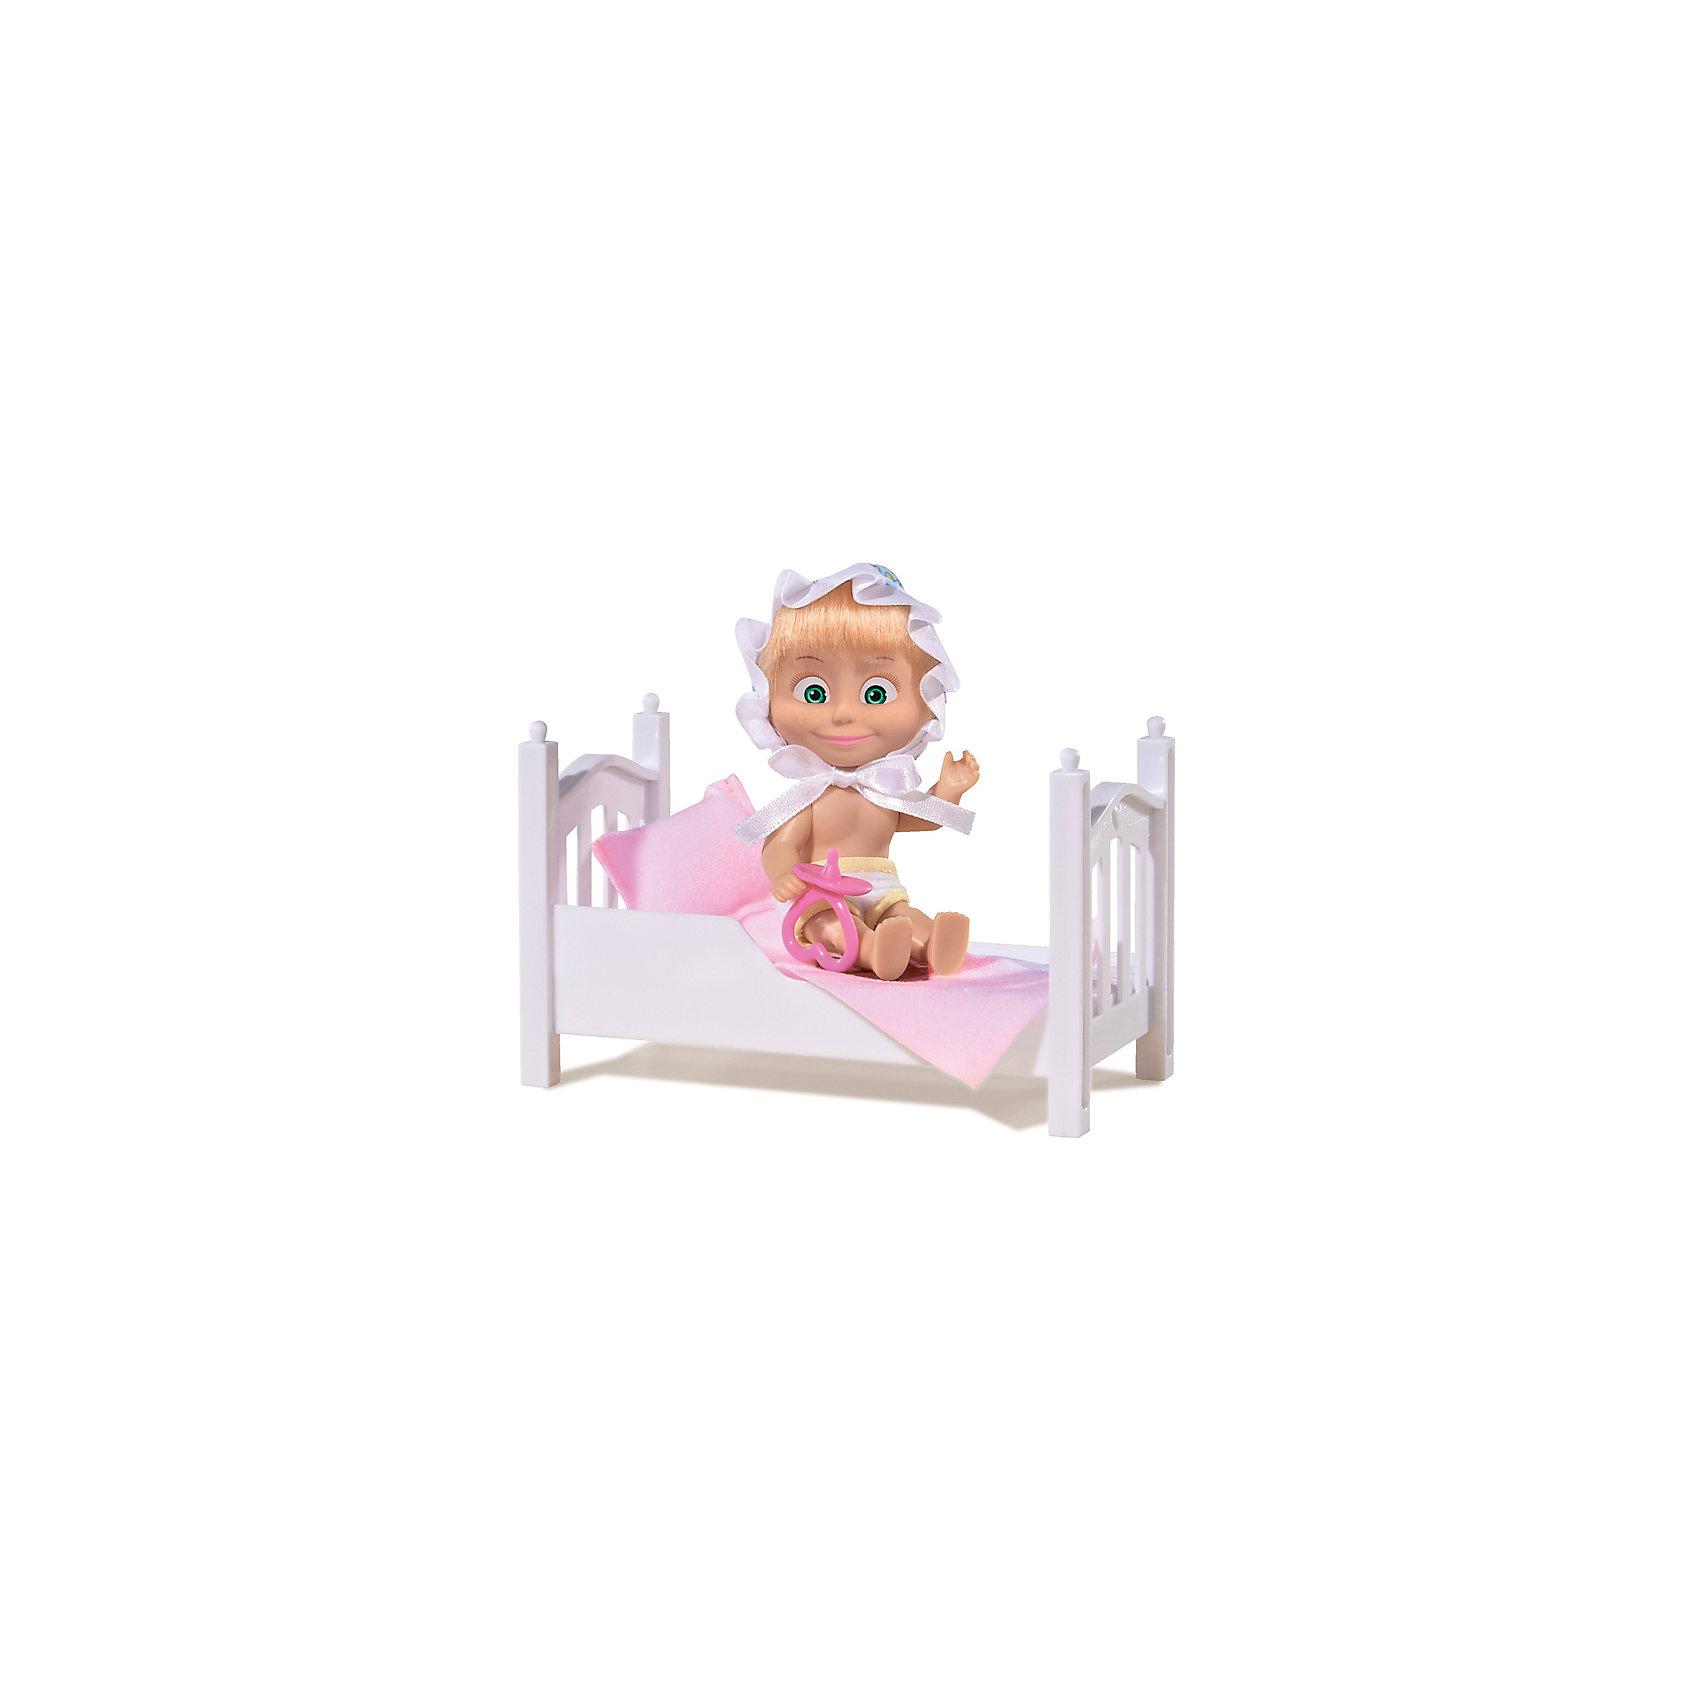 Simba Кукла Маша с кроваткой, Маша и Медведь, Simba